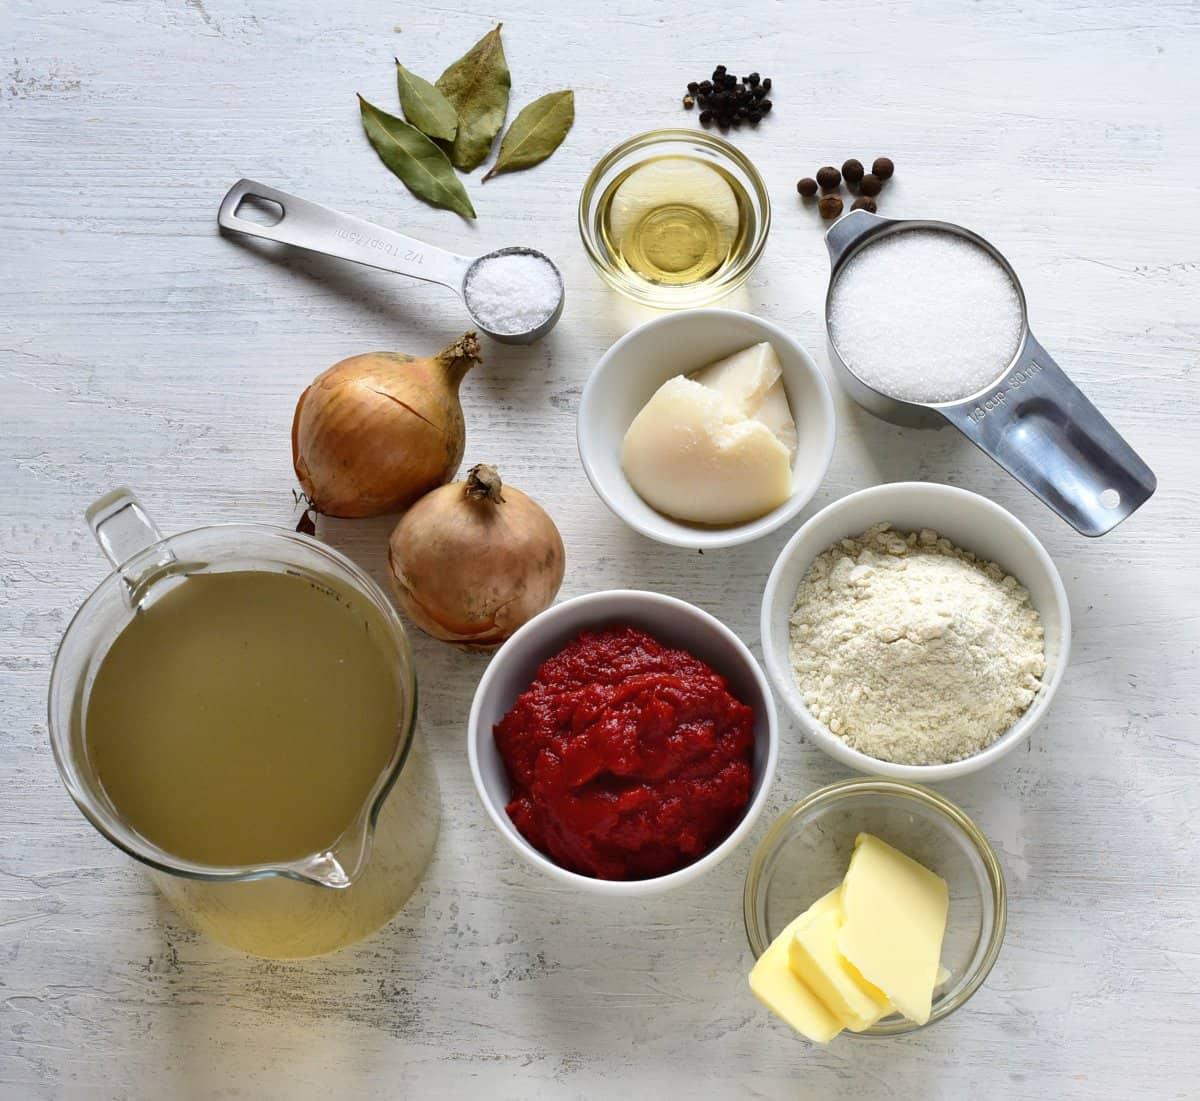 ingredients for czech rajská omáčka sauce